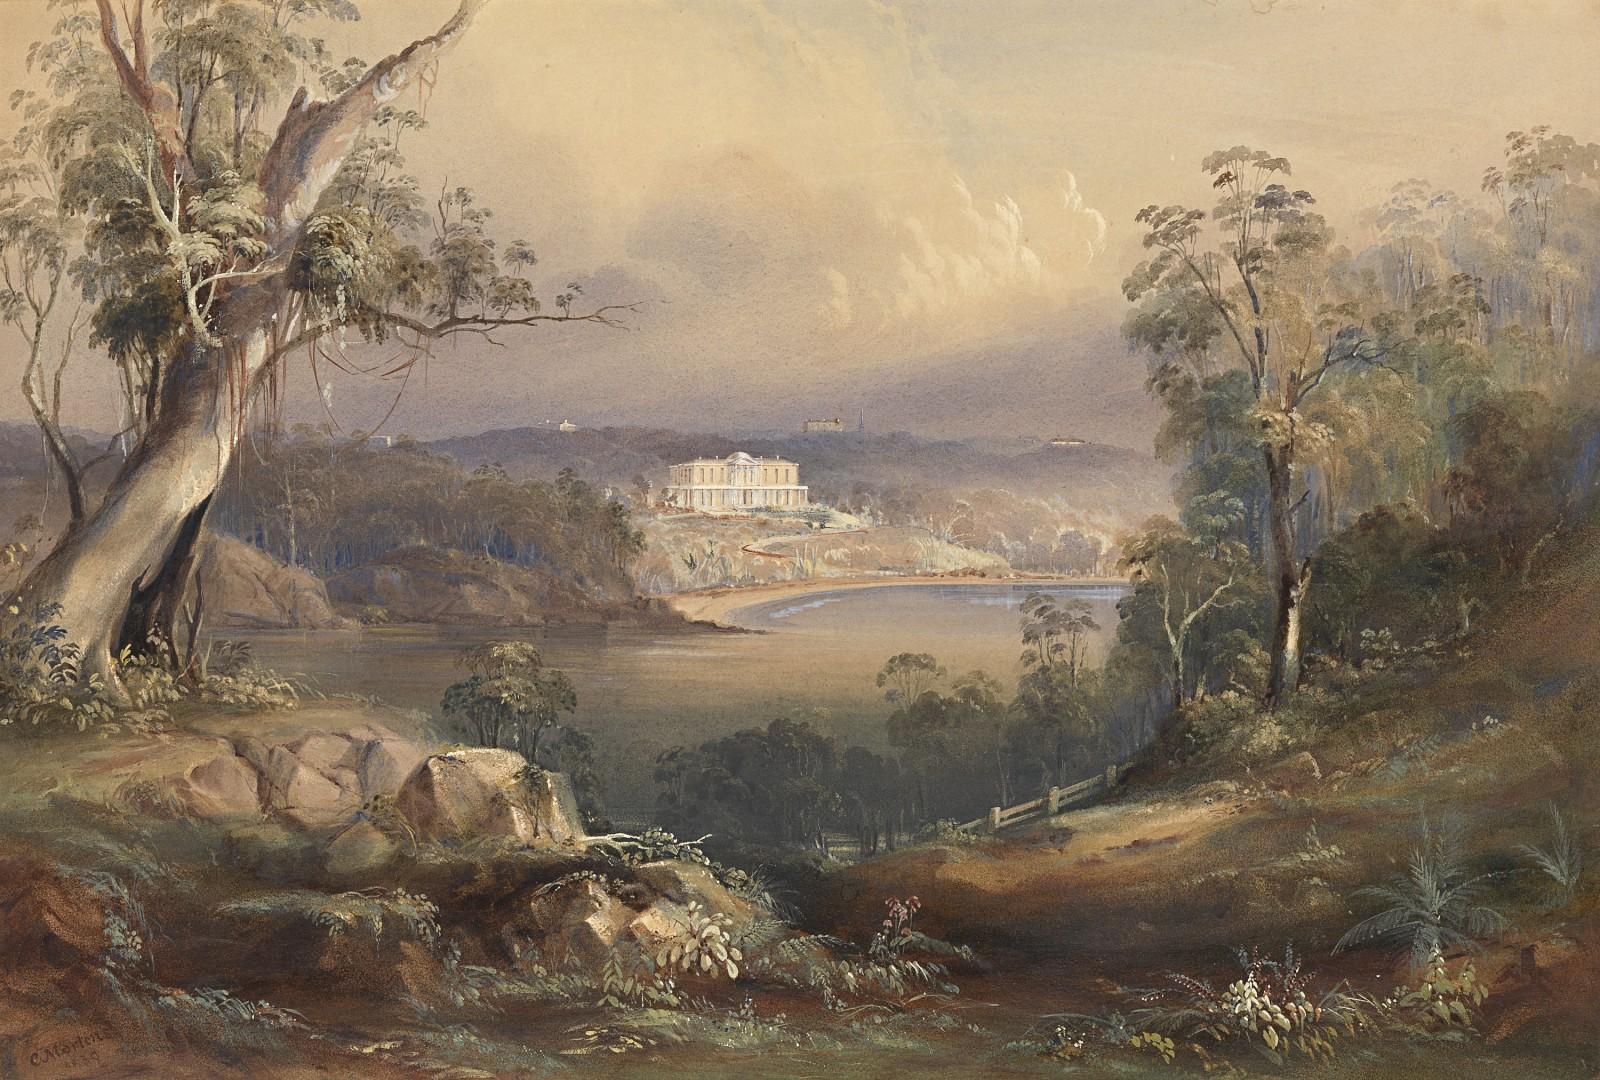 Elizabeth Bay and Elizabeth Bay House 1839. Conrad Martens born England 1801, arrived Australia 1835, died 1878 - watercolour 46.1 x 66.3cm. National Gallery of Victoria, Melbourne, Felton Bequest, 1950.